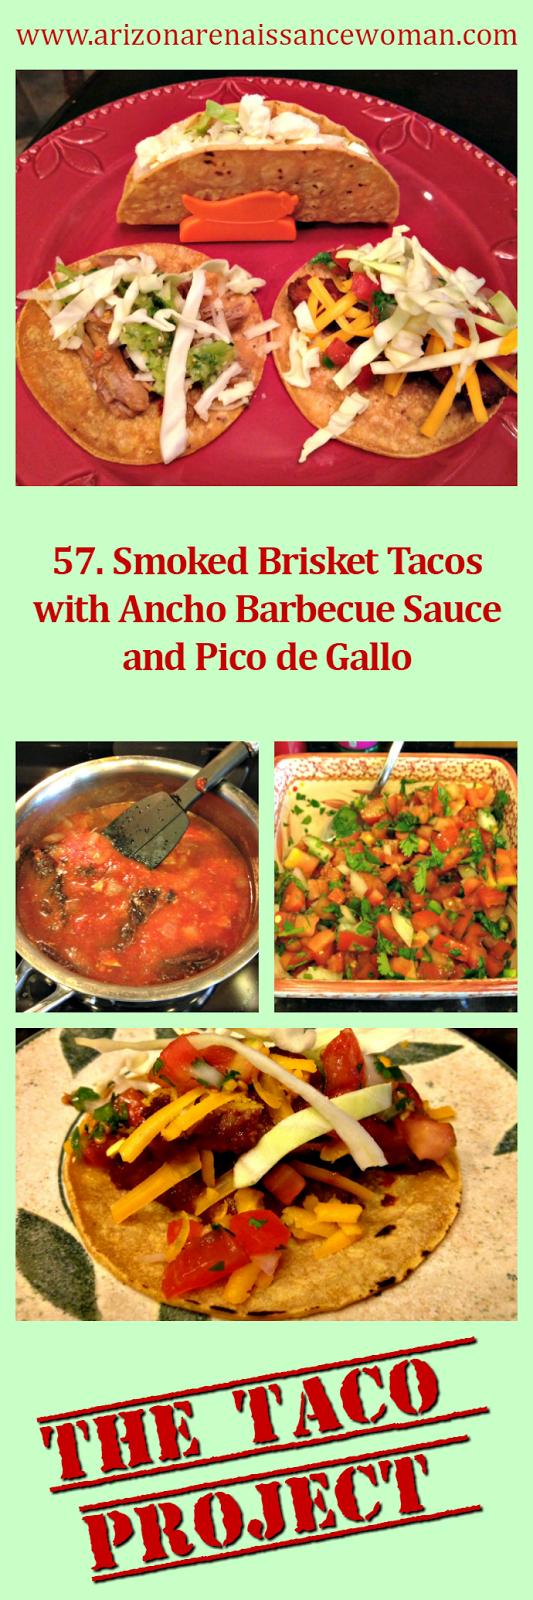 Smoked Brisket Tacos with Ancho Barbecue Sauce and Pico de Gallo Collage